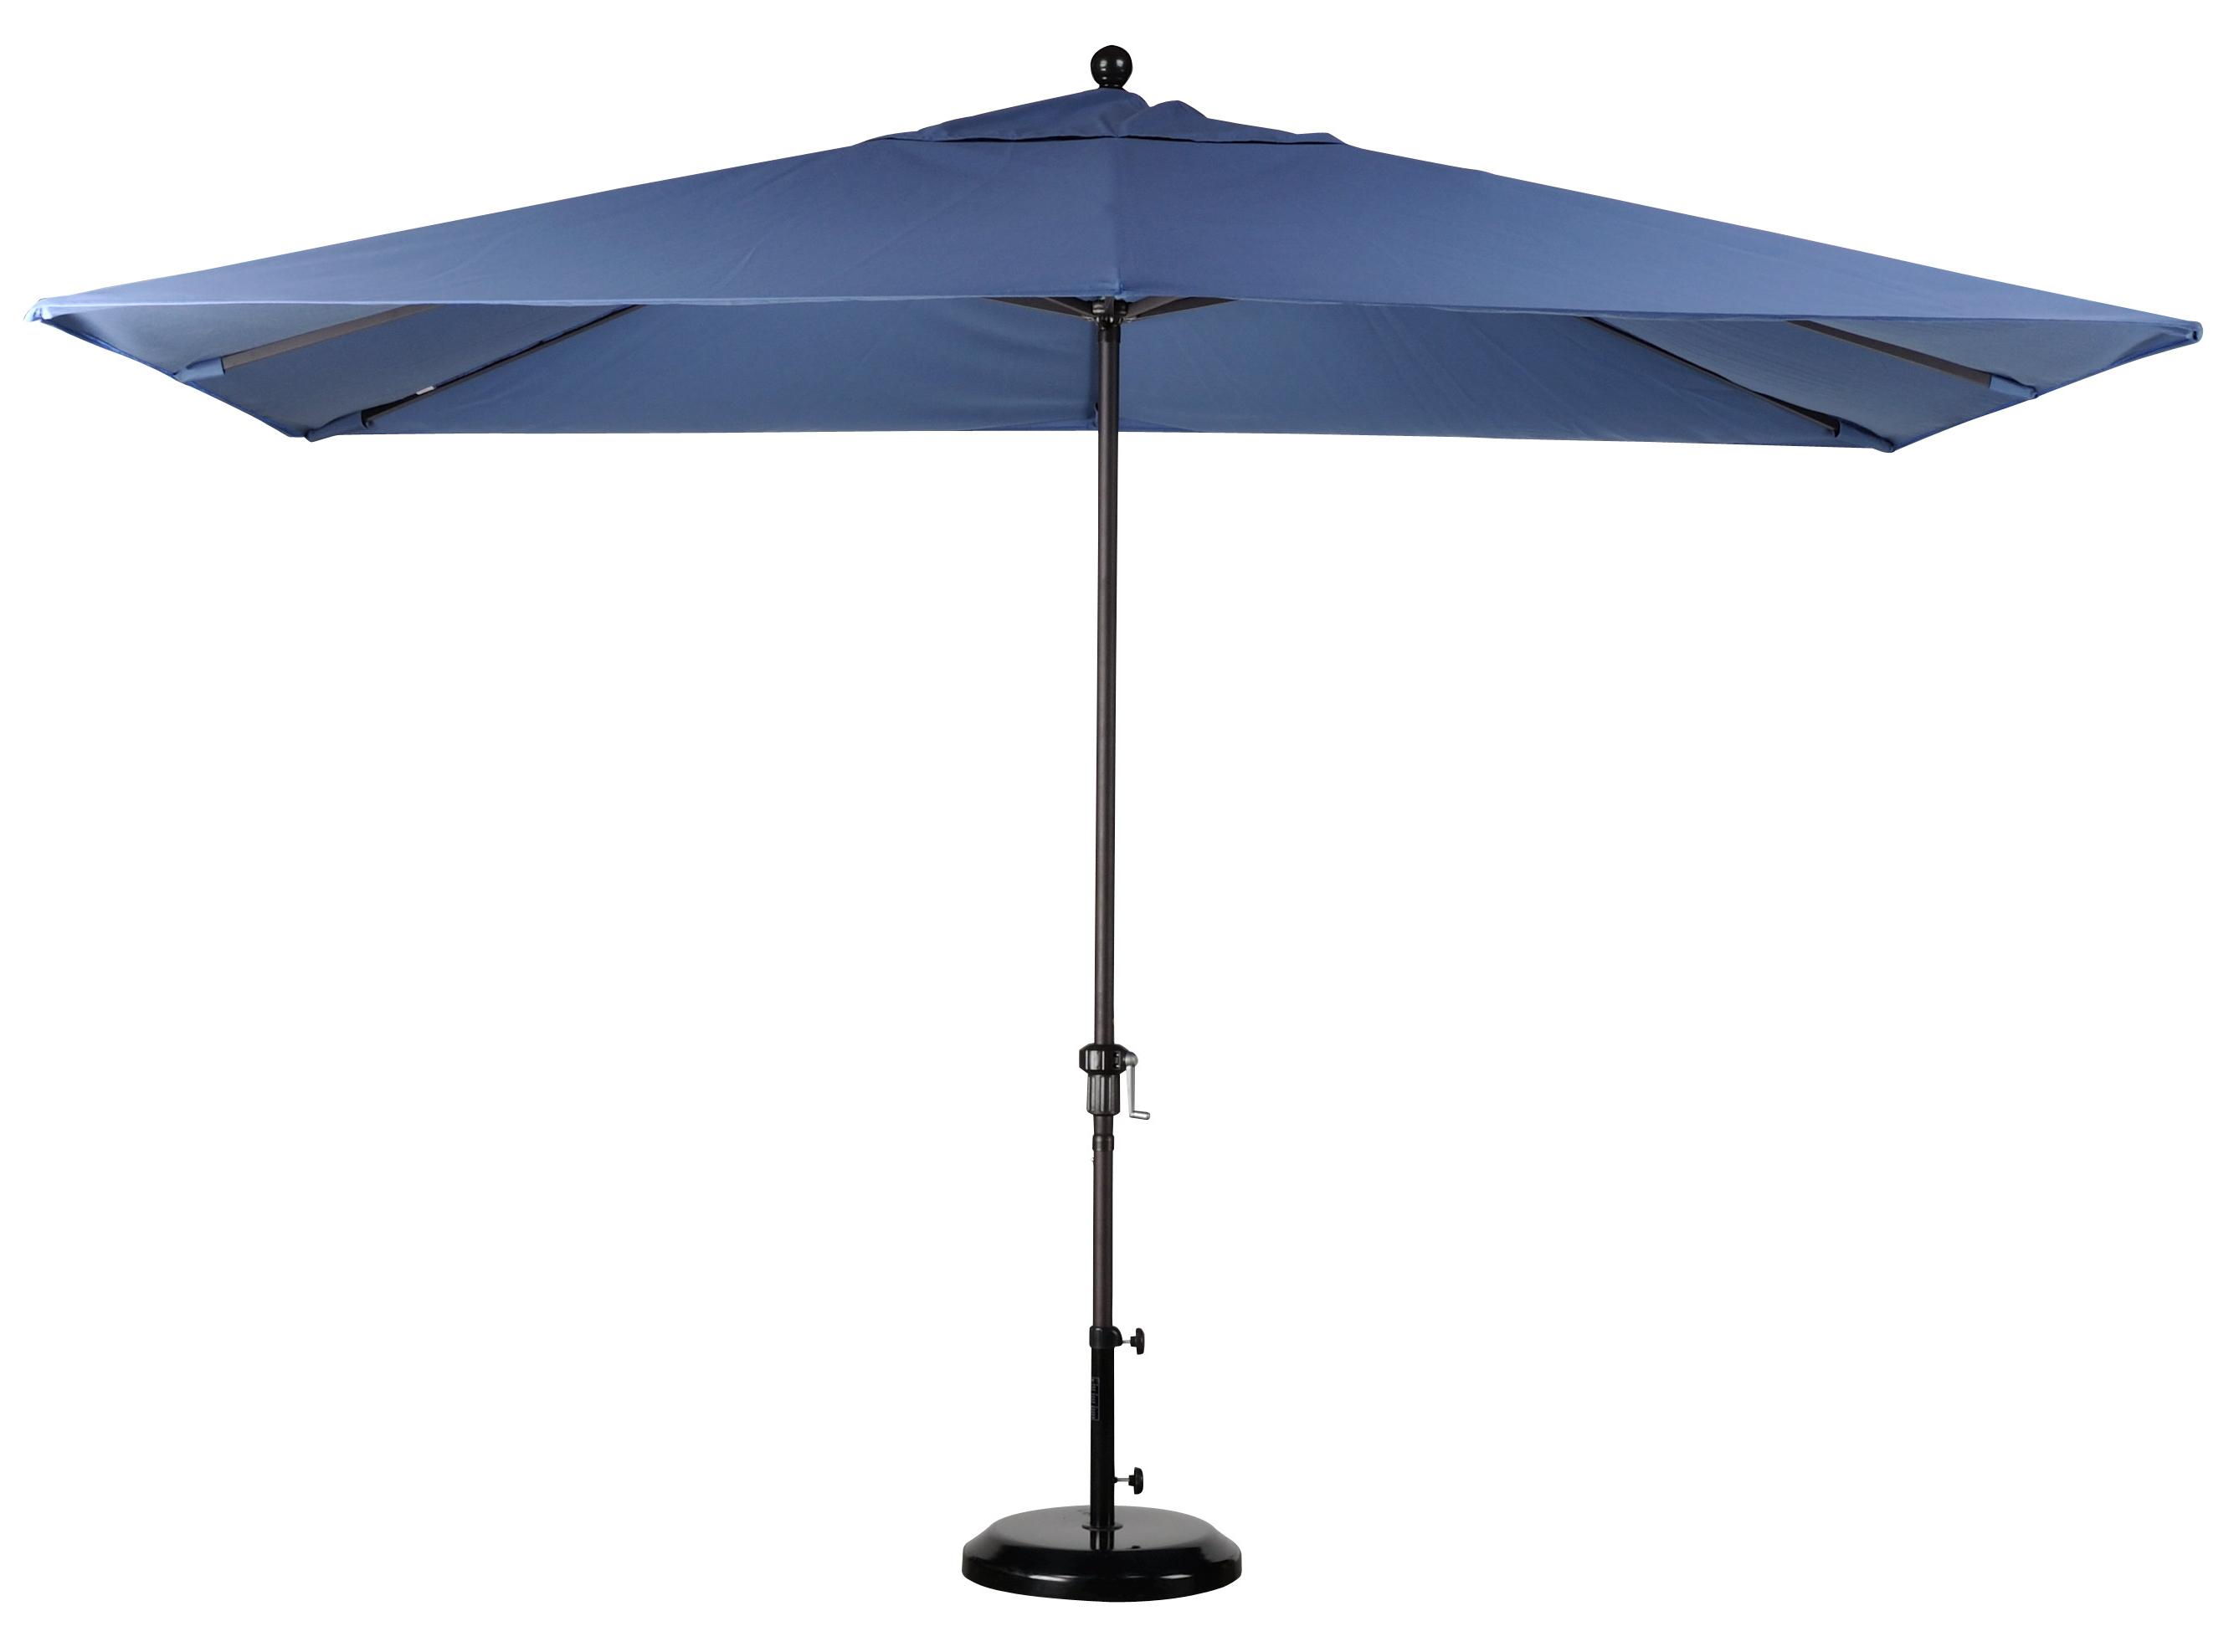 Solid Rectangular Market Umbrellas Intended For Popular Best Selection Rectangular Market Umbrellas – Featuring Sunbrella (View 16 of 20)